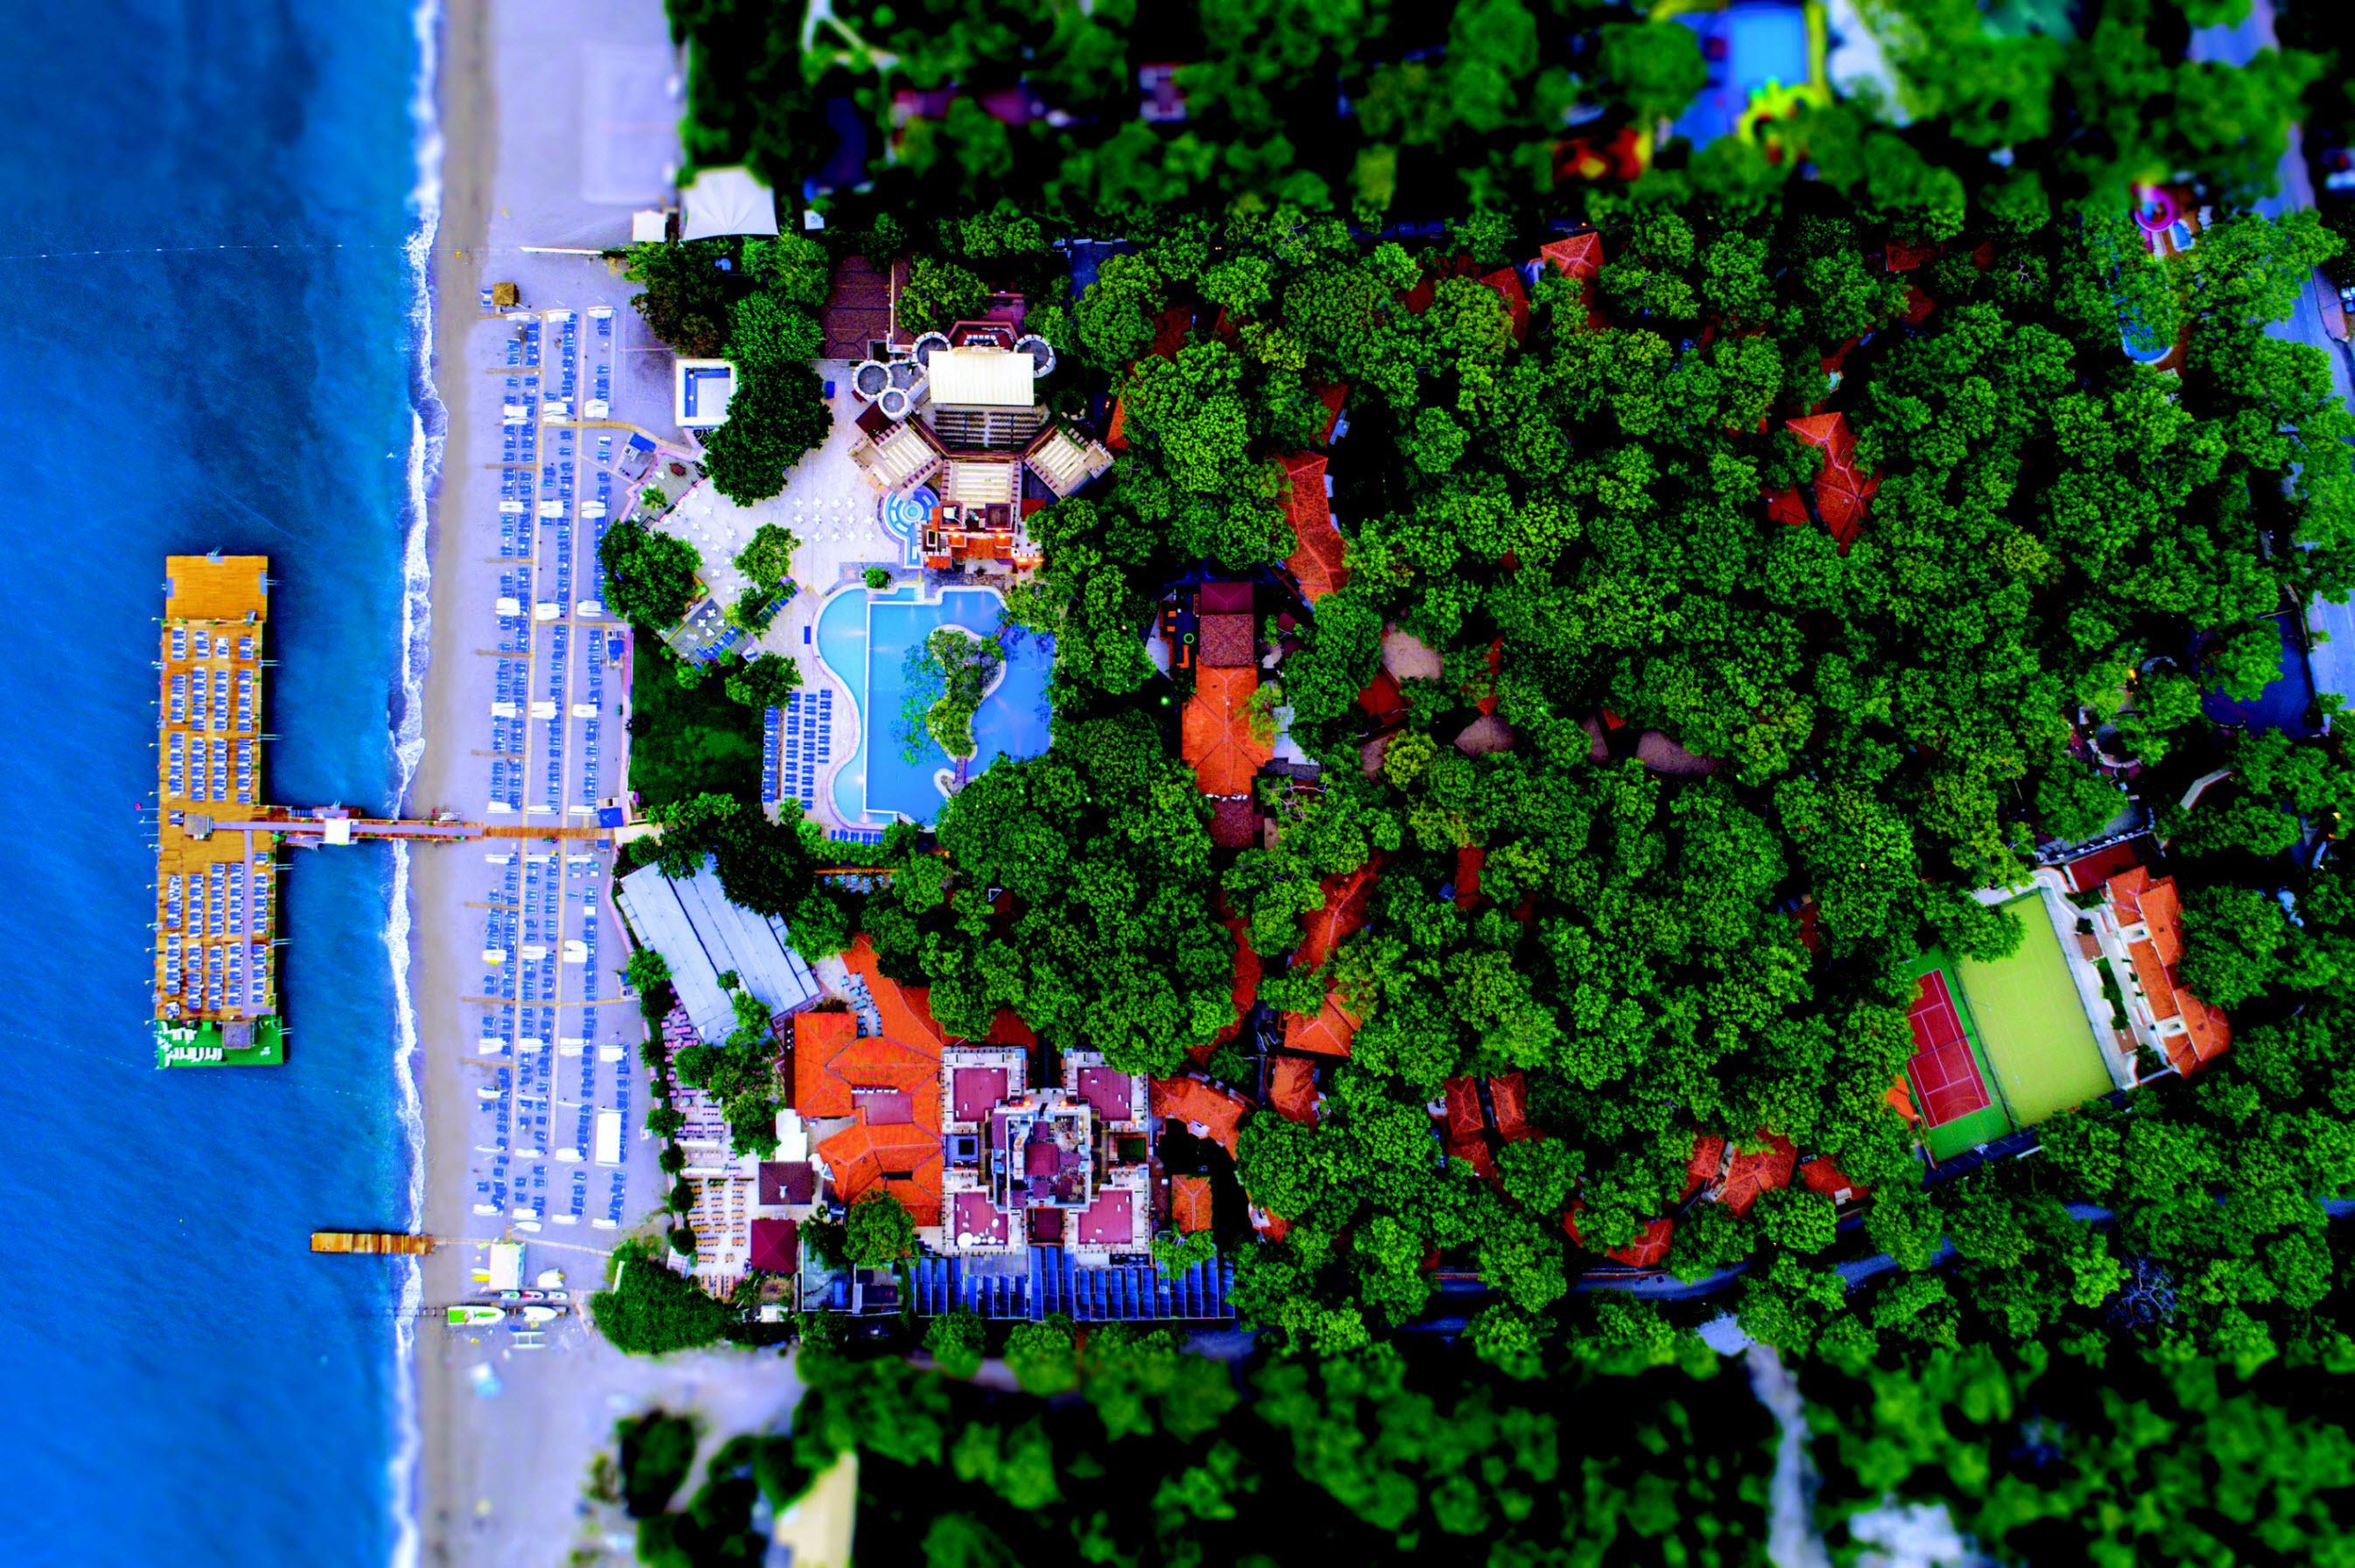 http://www.orextravel.sk/OREX/hotelphotos/ulusoy-kemer-holiday-club-area-007.jpg